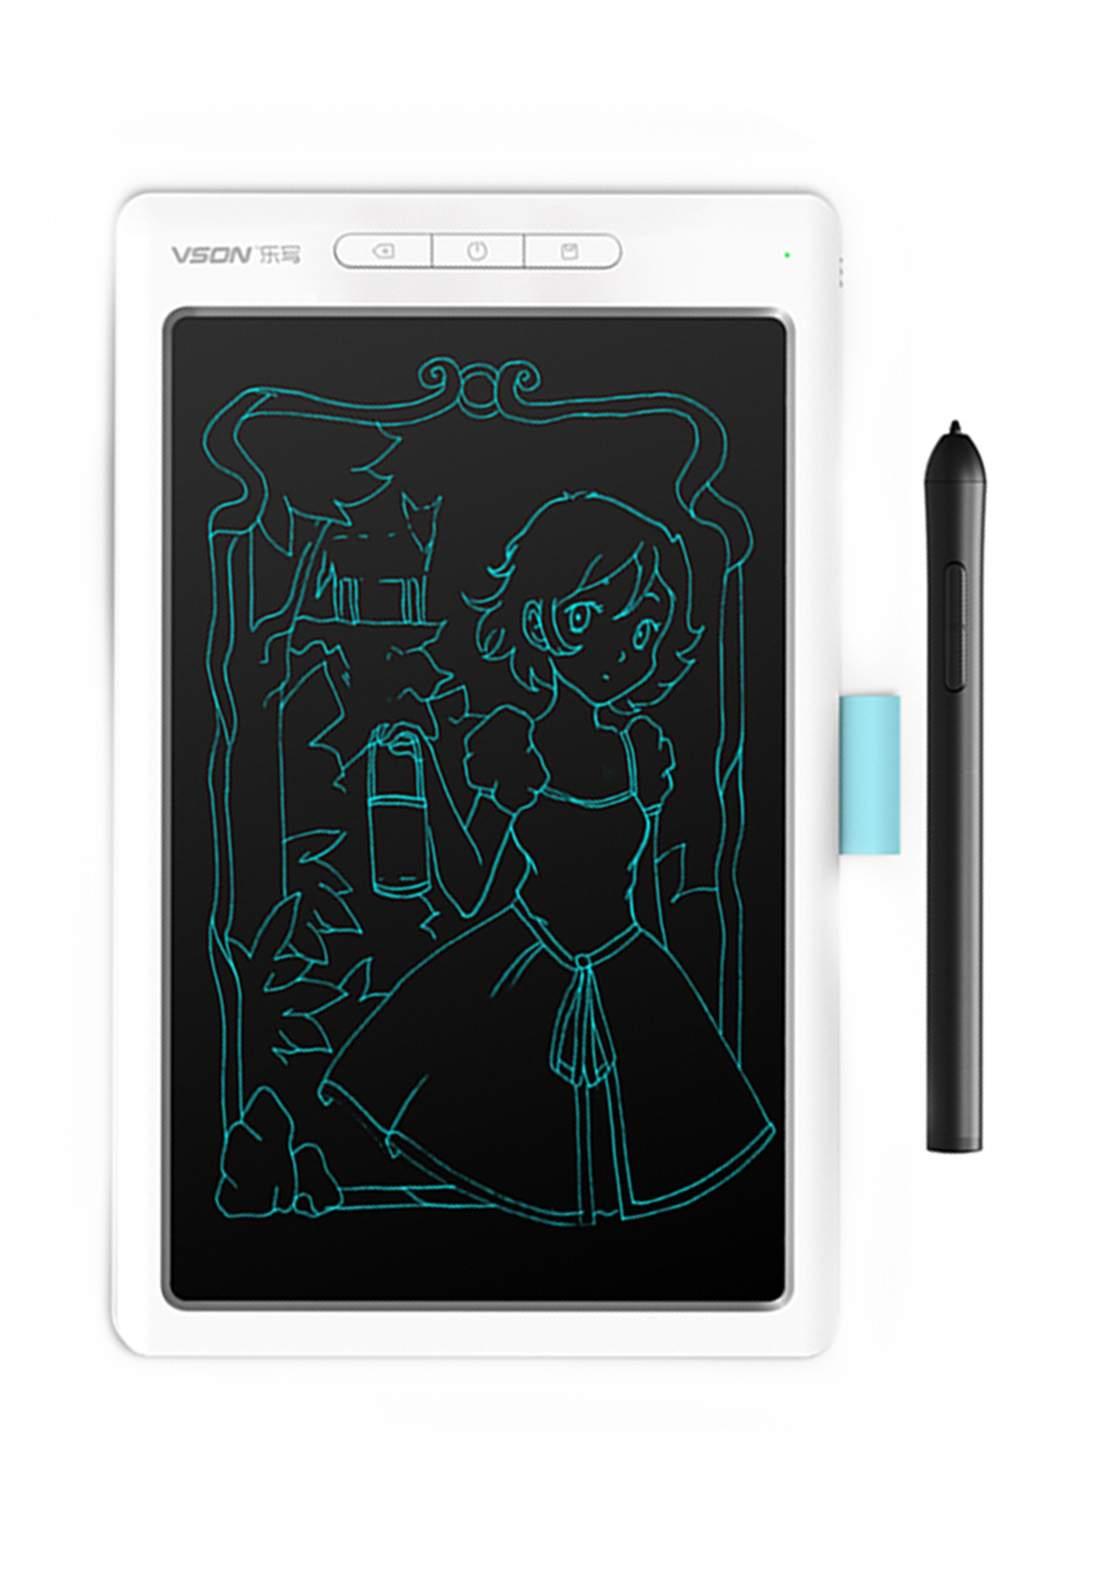 Vson Wp12 Graphical Tablet - White  لوح رسم وكتابة ذكي